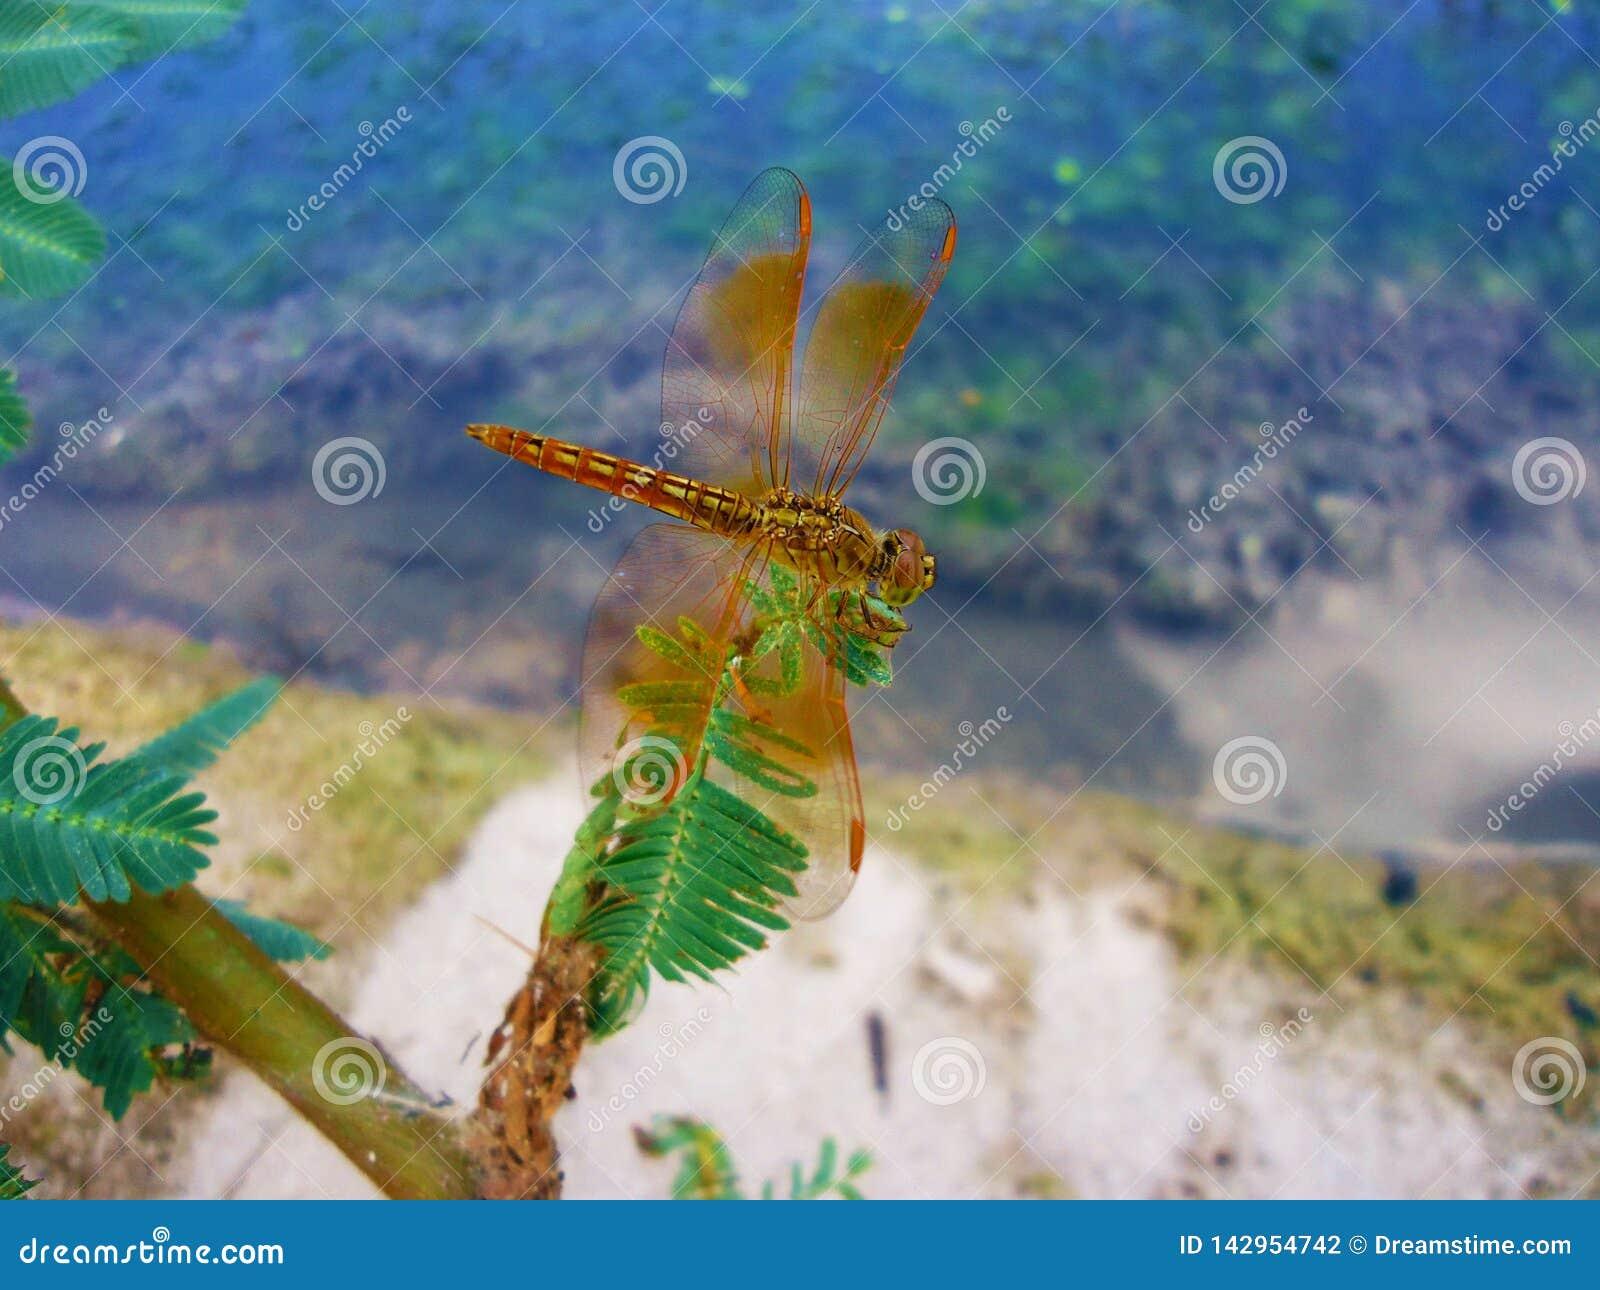 Dragonfly, Dragonflys